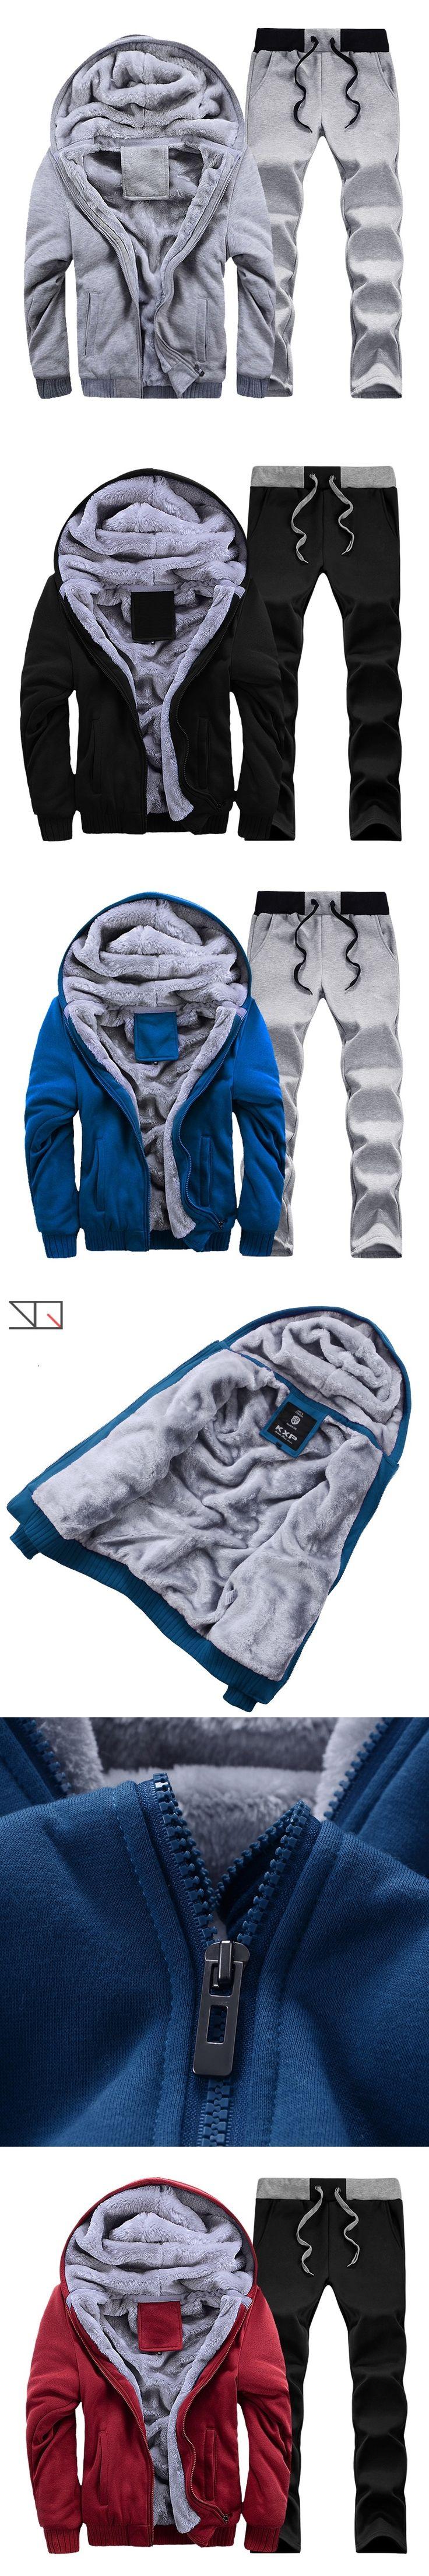 Tracksuit Mens Casual Warm Cotton Sportwear Winter Thick fleece Cardigans Sets Sweatshirt Men xxxxl #D59